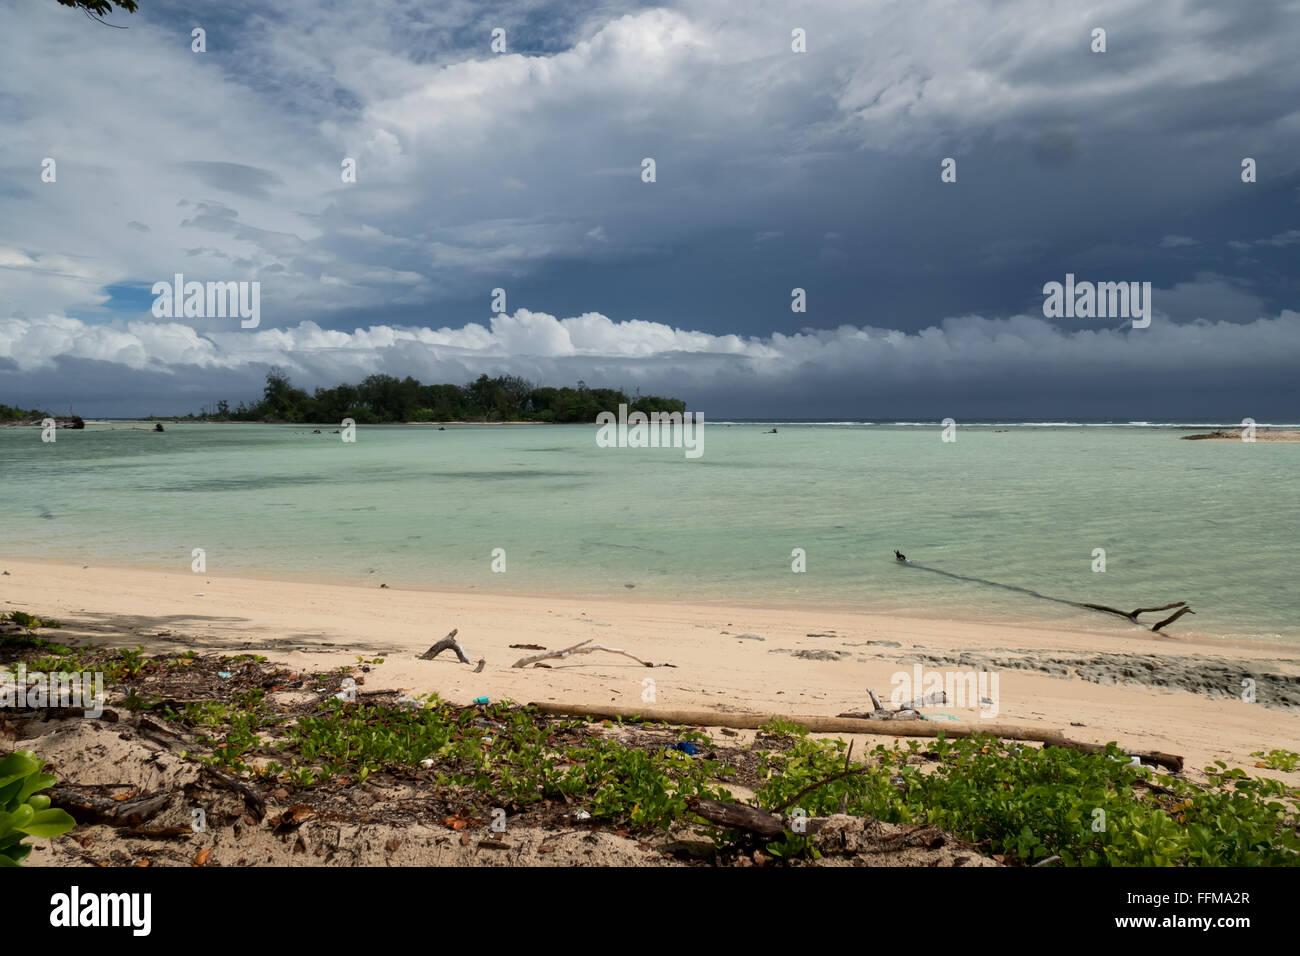 Palau, Micronesia, Pacific Ocean. White sand beach, atoll, lagoon. Sea, nature, island landscape, storm, rainstorm, - Stock Image